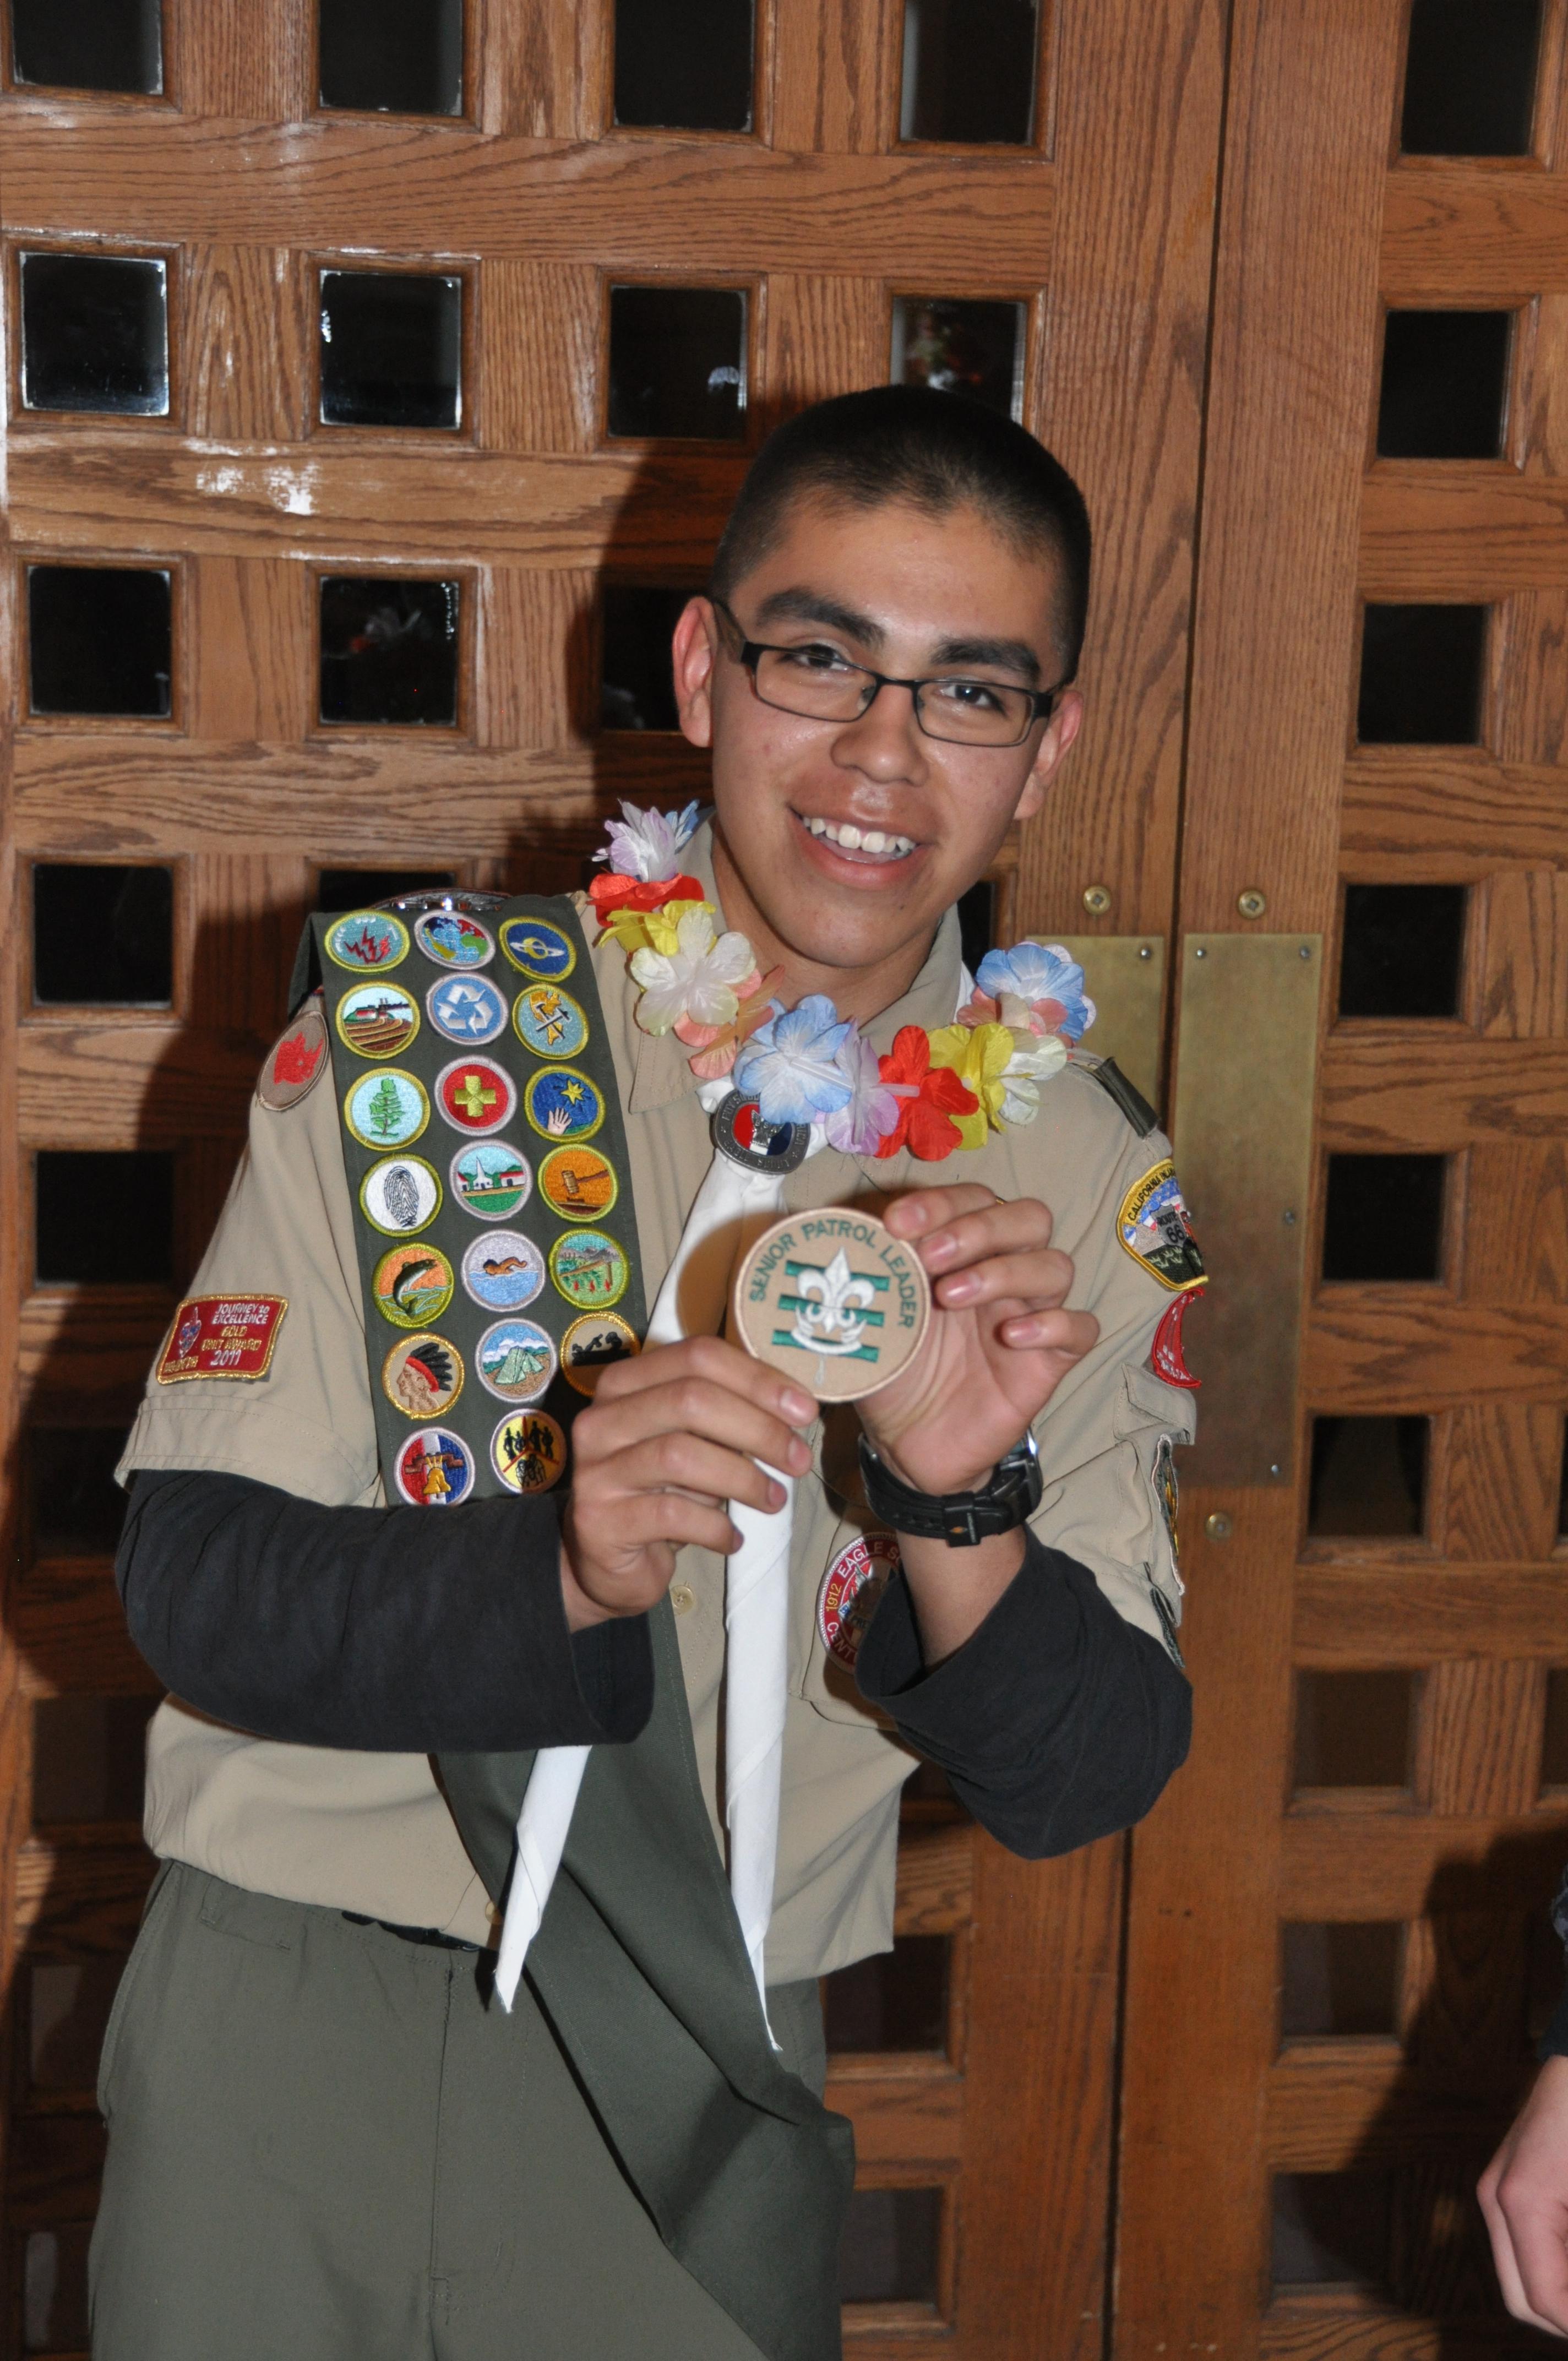 Samaniego Elected Senior Patrol Leader for Troop 11